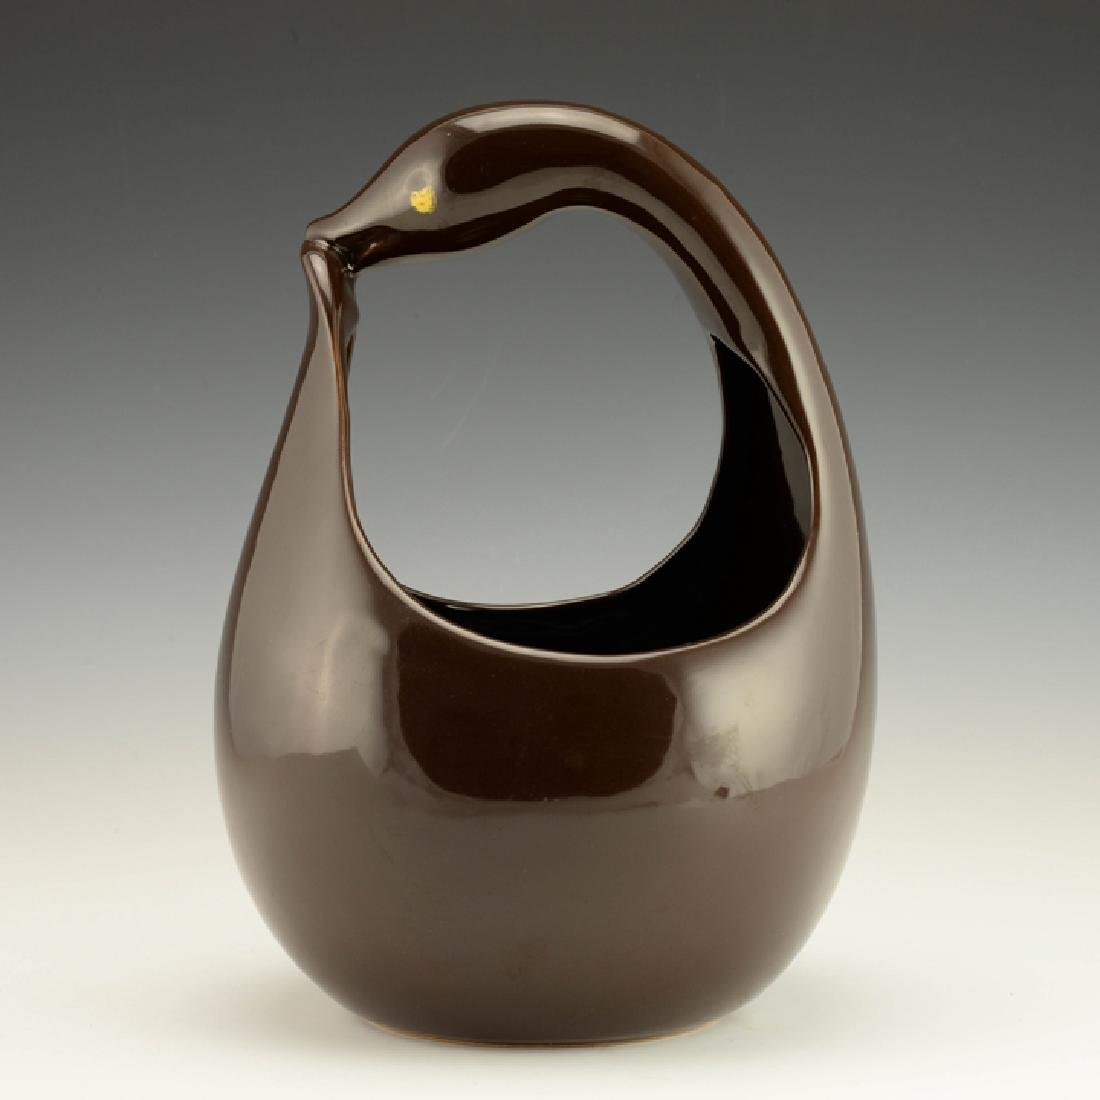 Rare Zeisel Hollydale Bird-Form Basket - 2